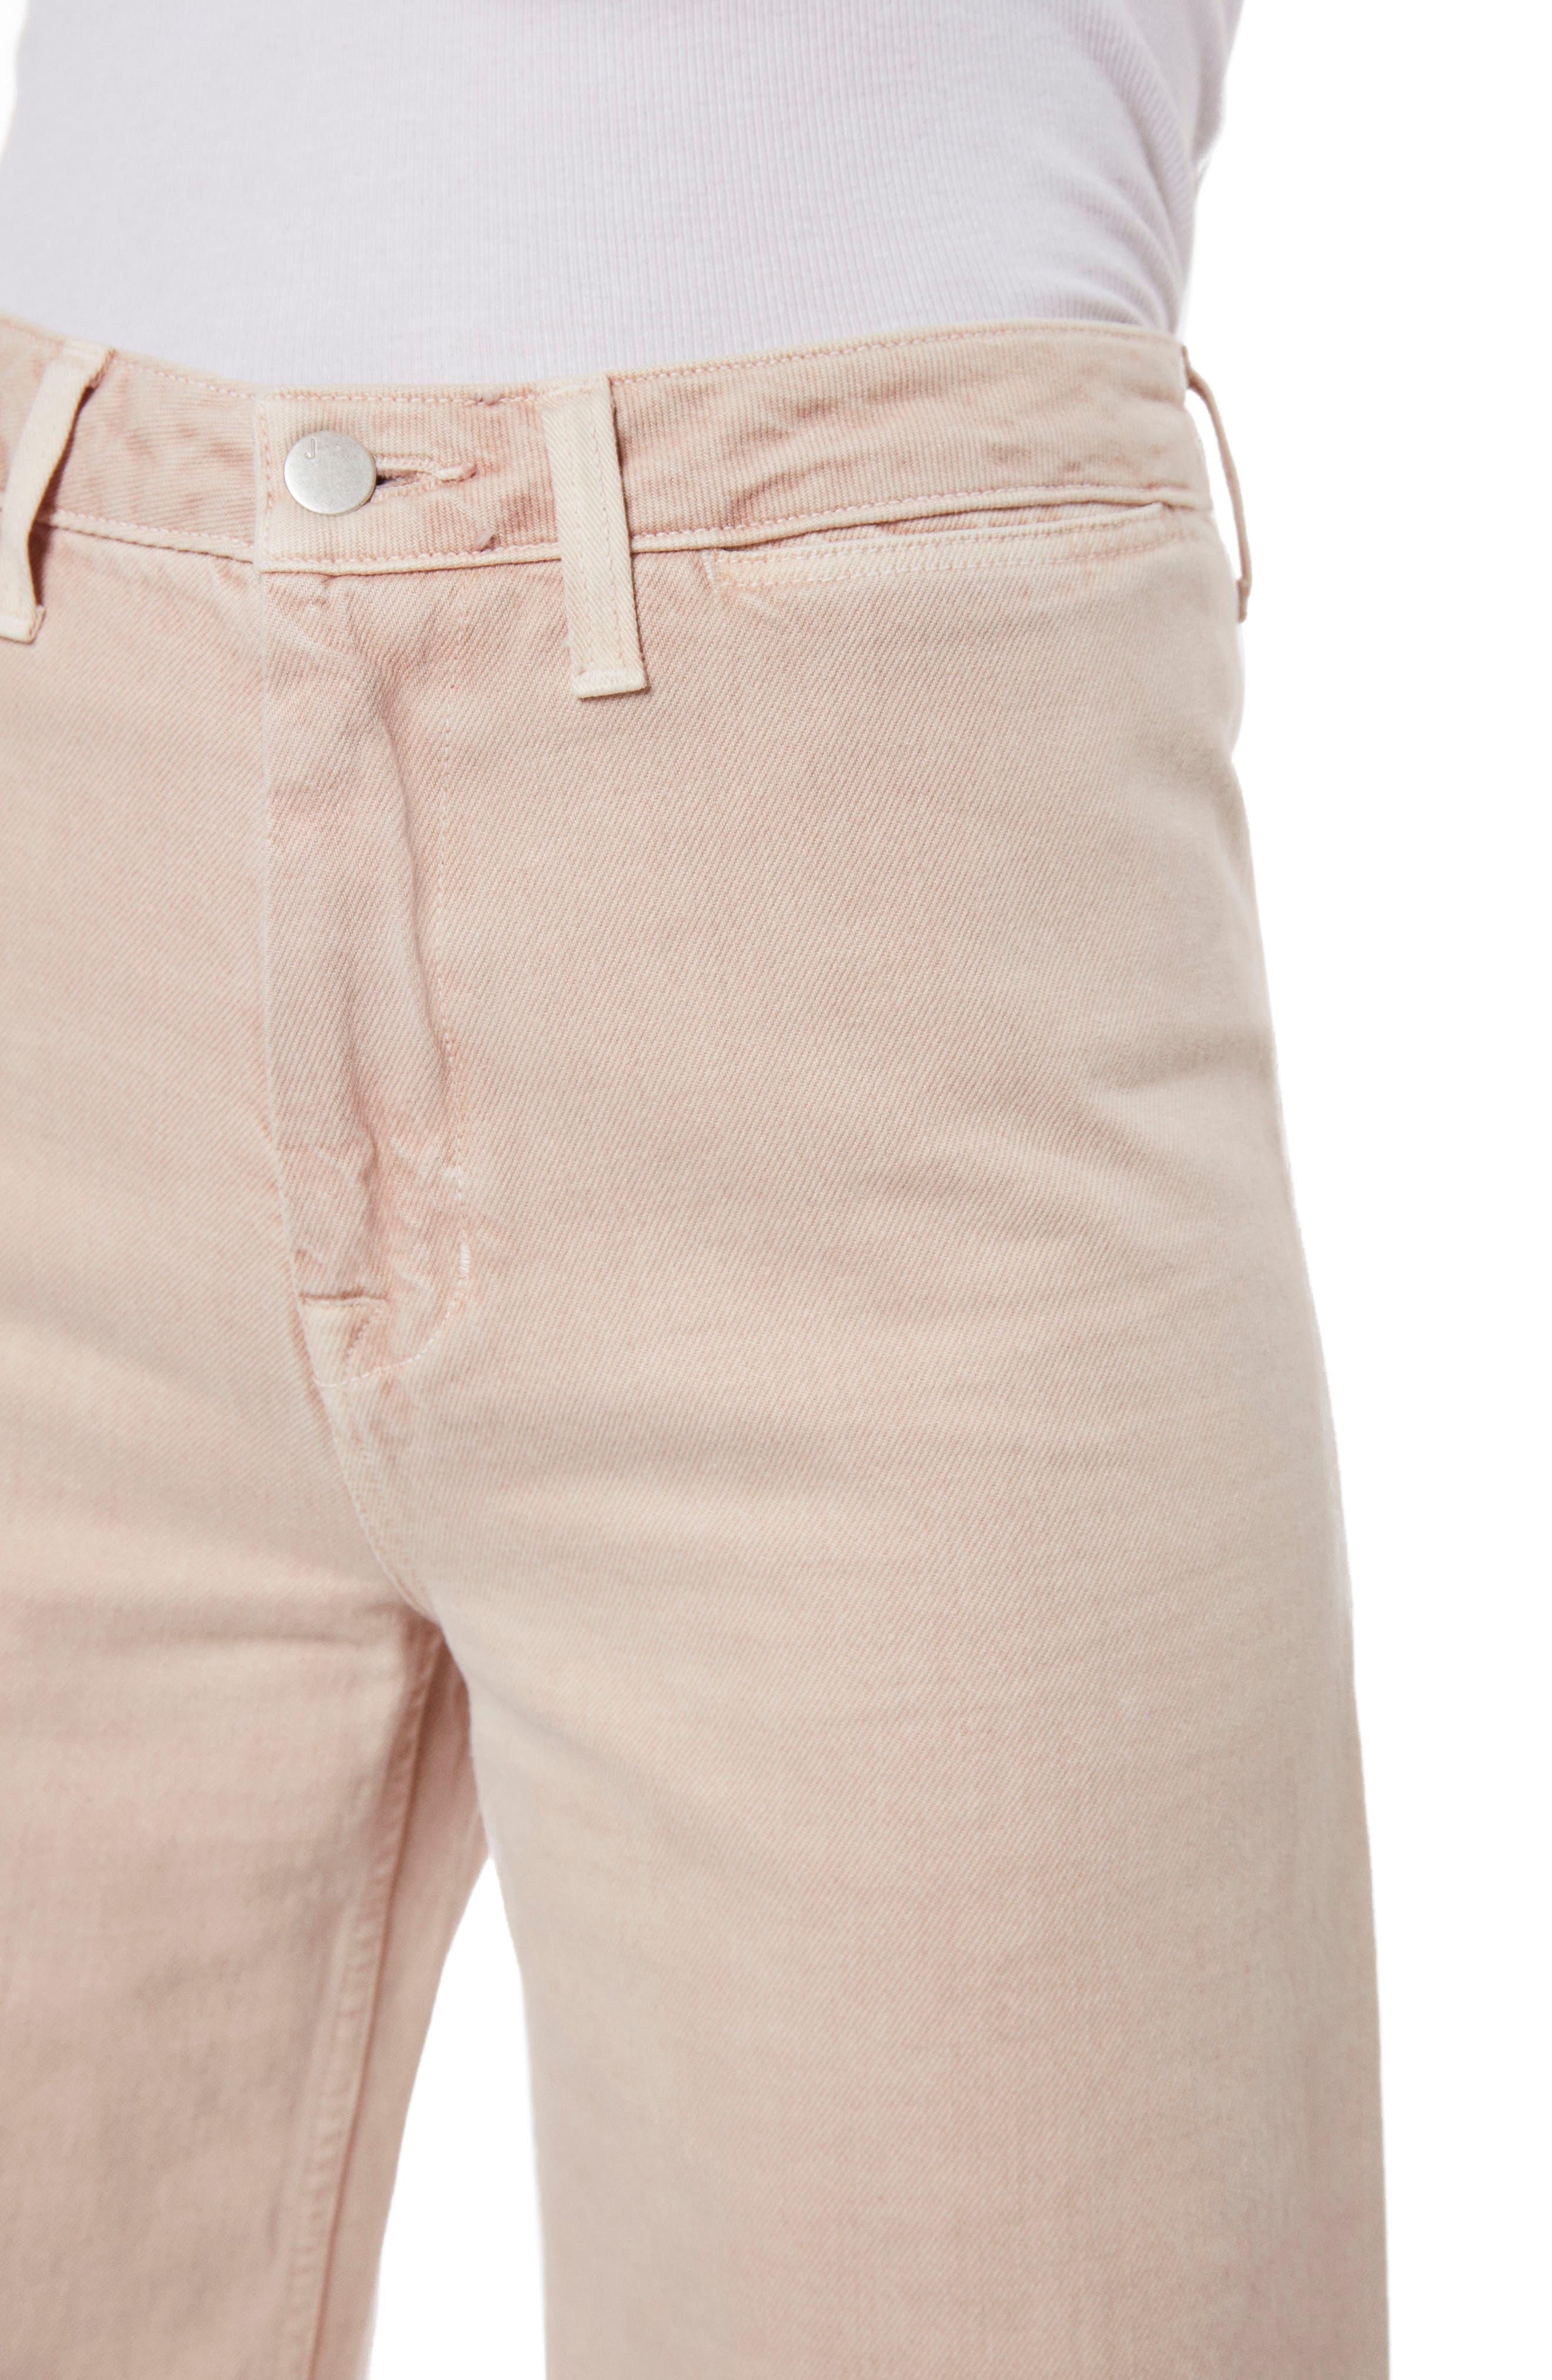 Hallton High Waist Wide Leg Jeans,                             Alternate thumbnail 4, color,